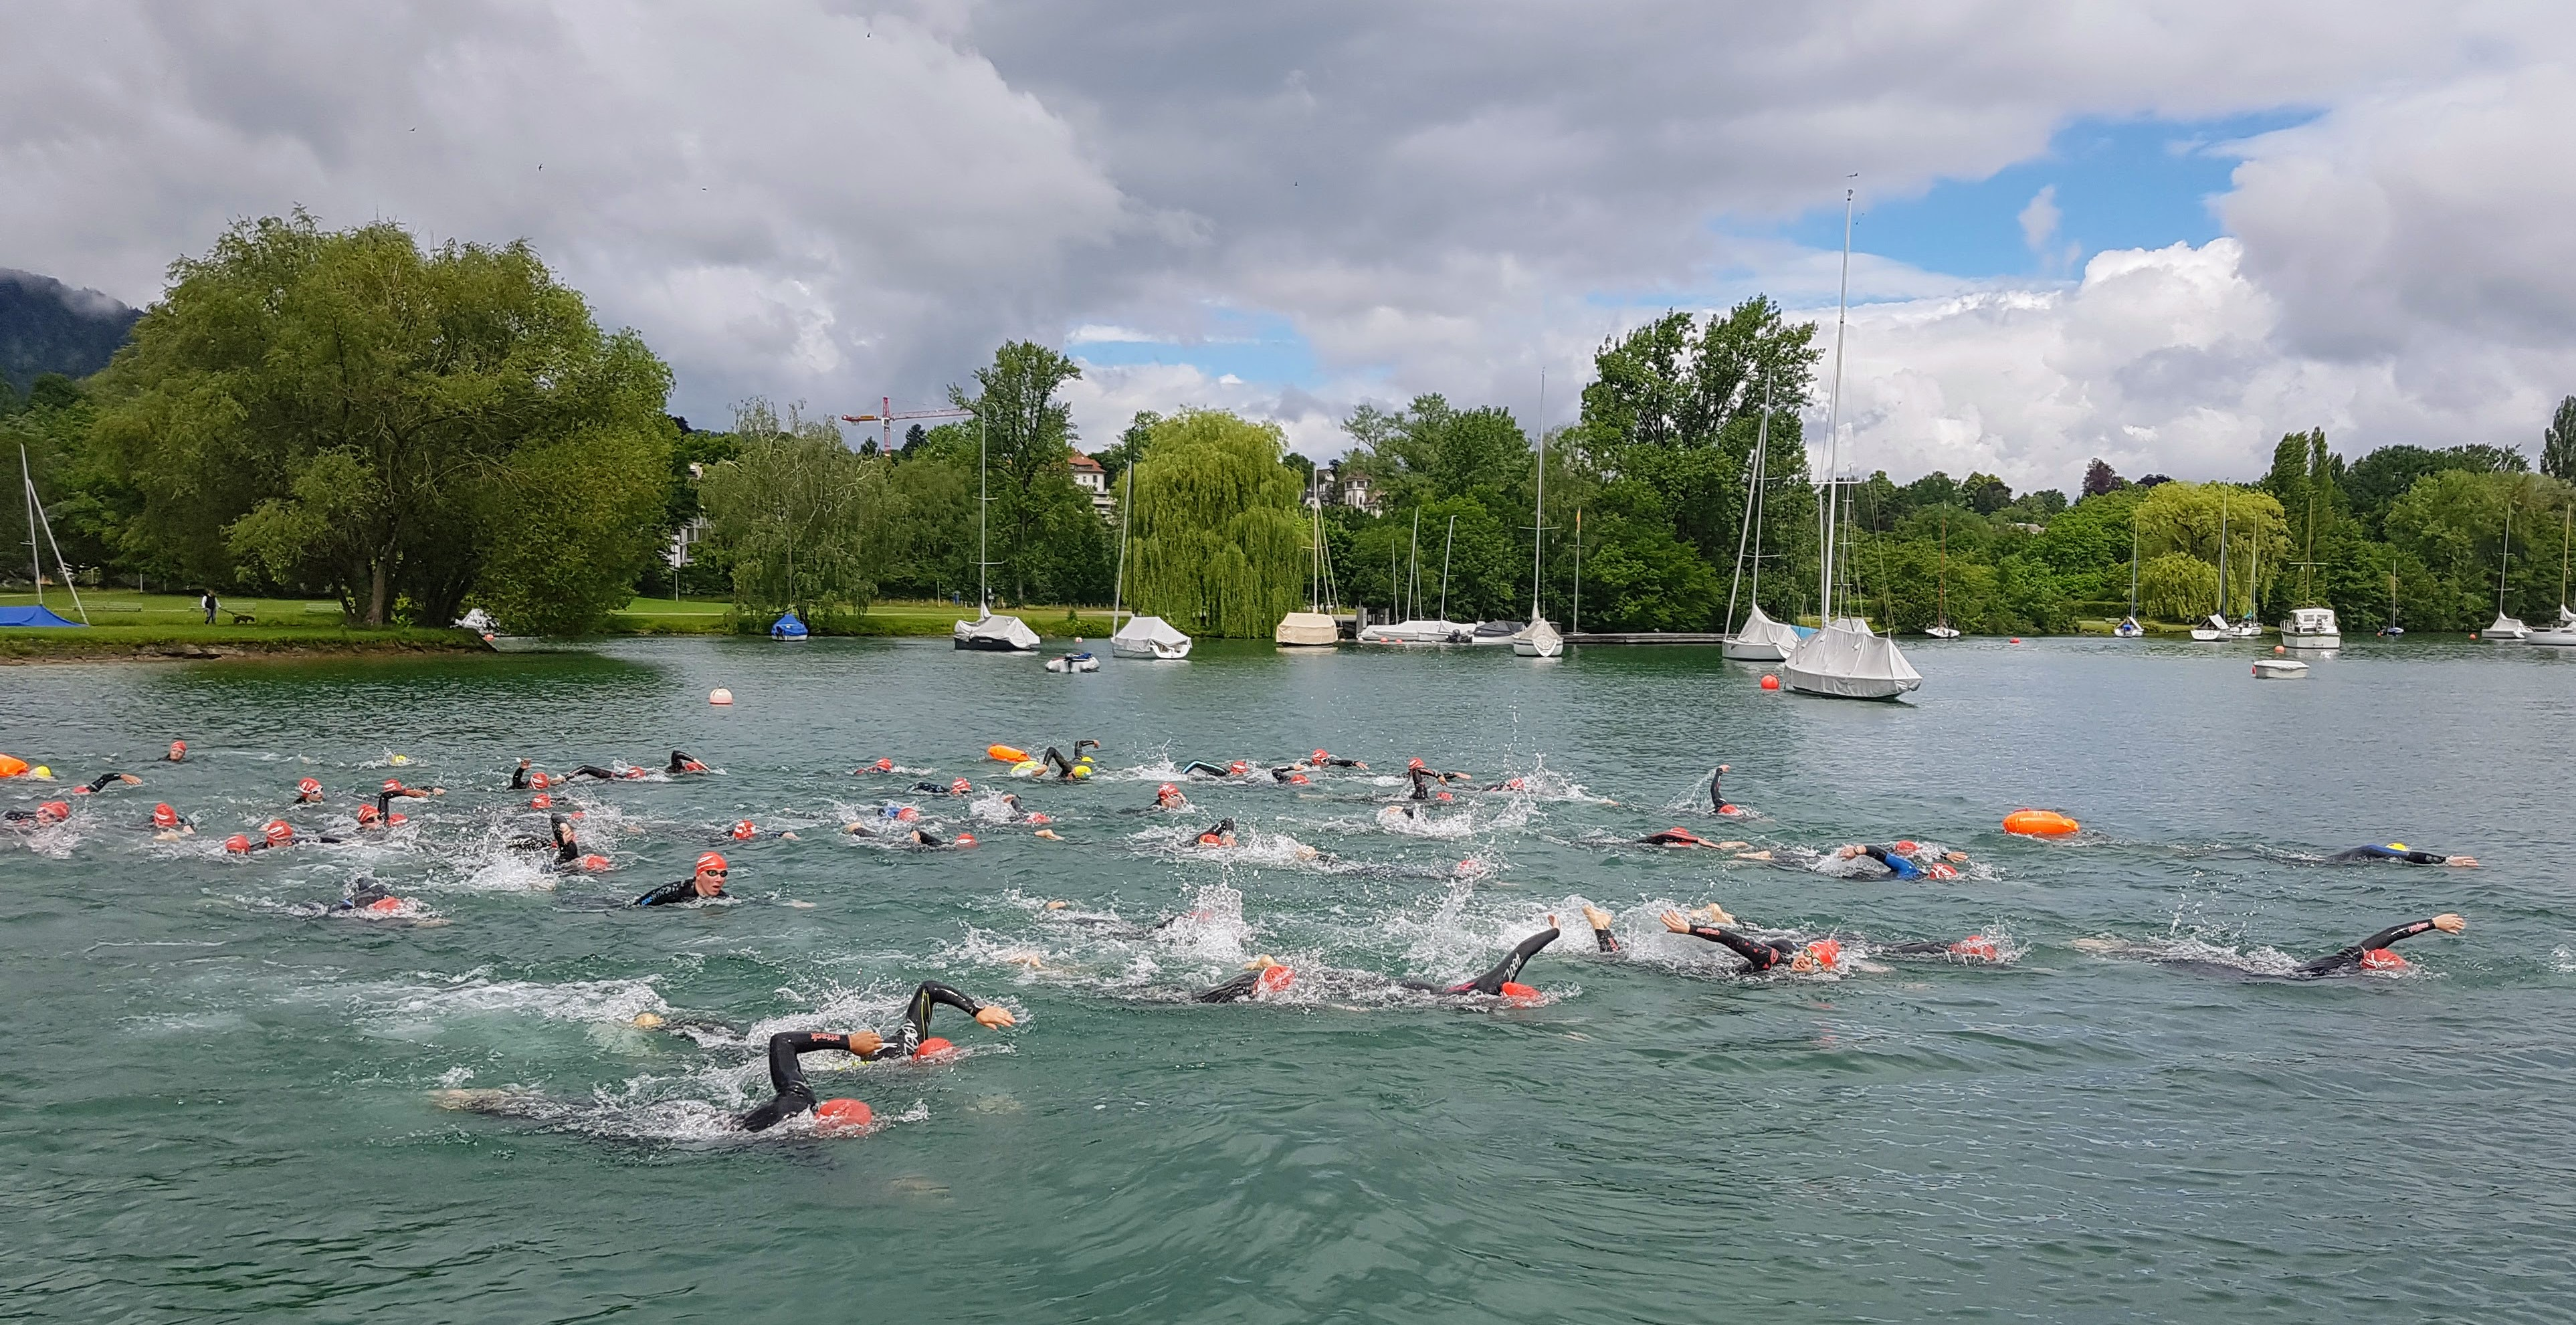 Gesucht: Bootsbegleitung Gigathlon Schwimmen